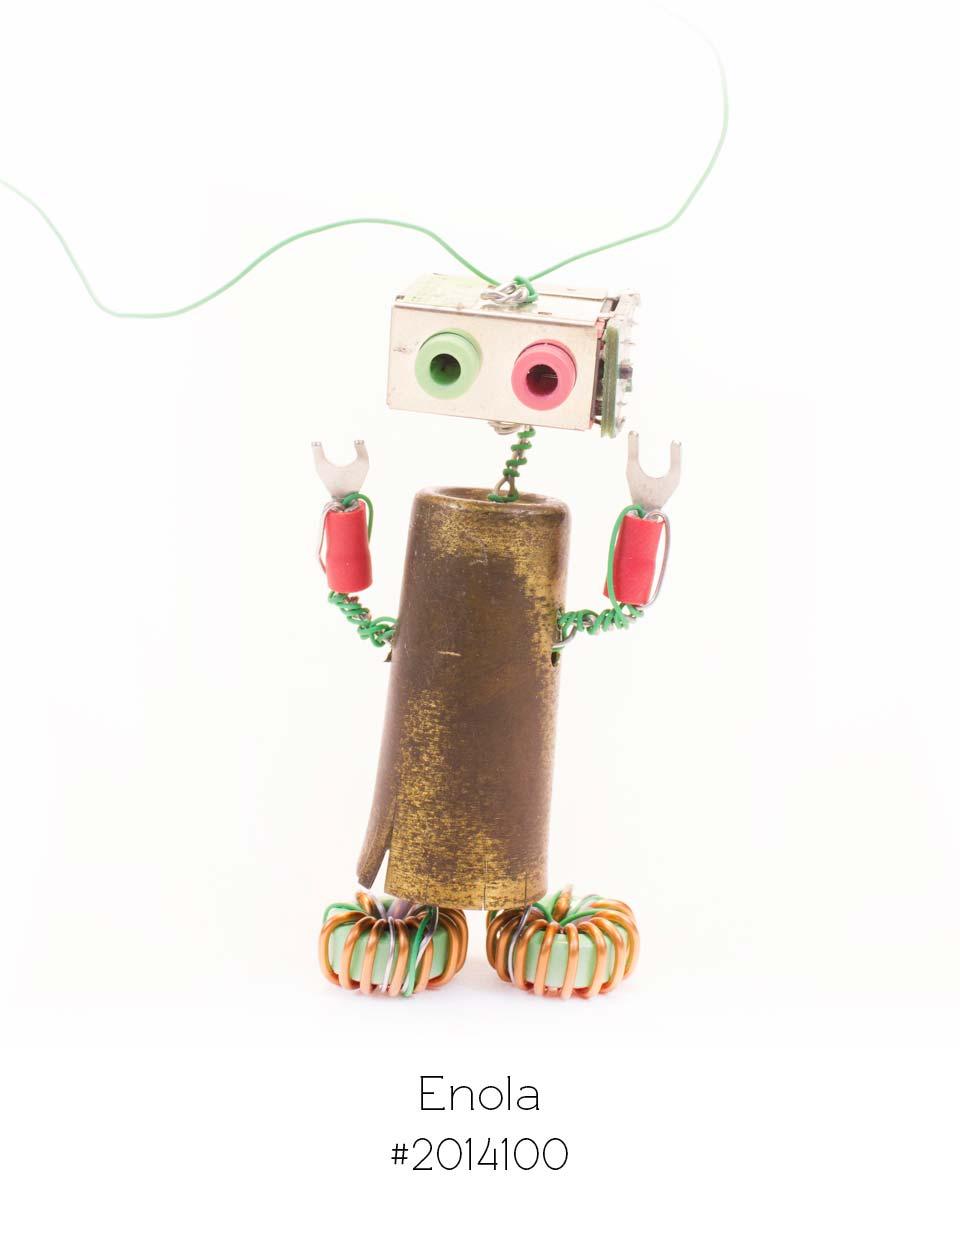 enola-1